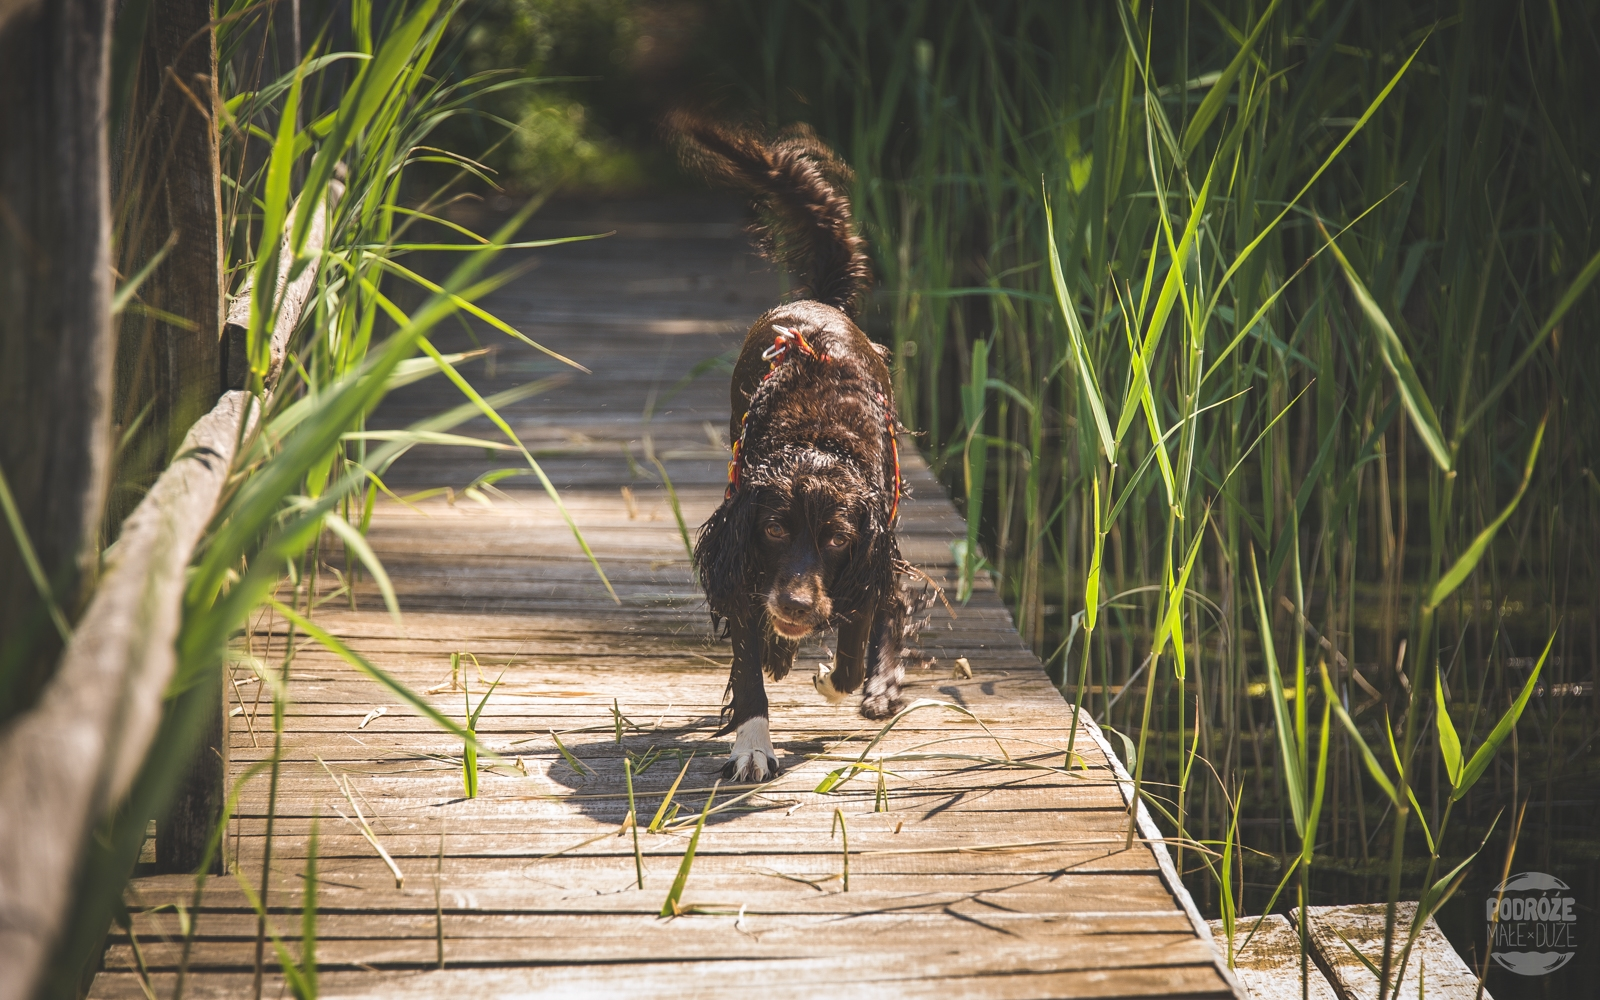 Warmia i Mazury jezioro pies Springer Spaniel